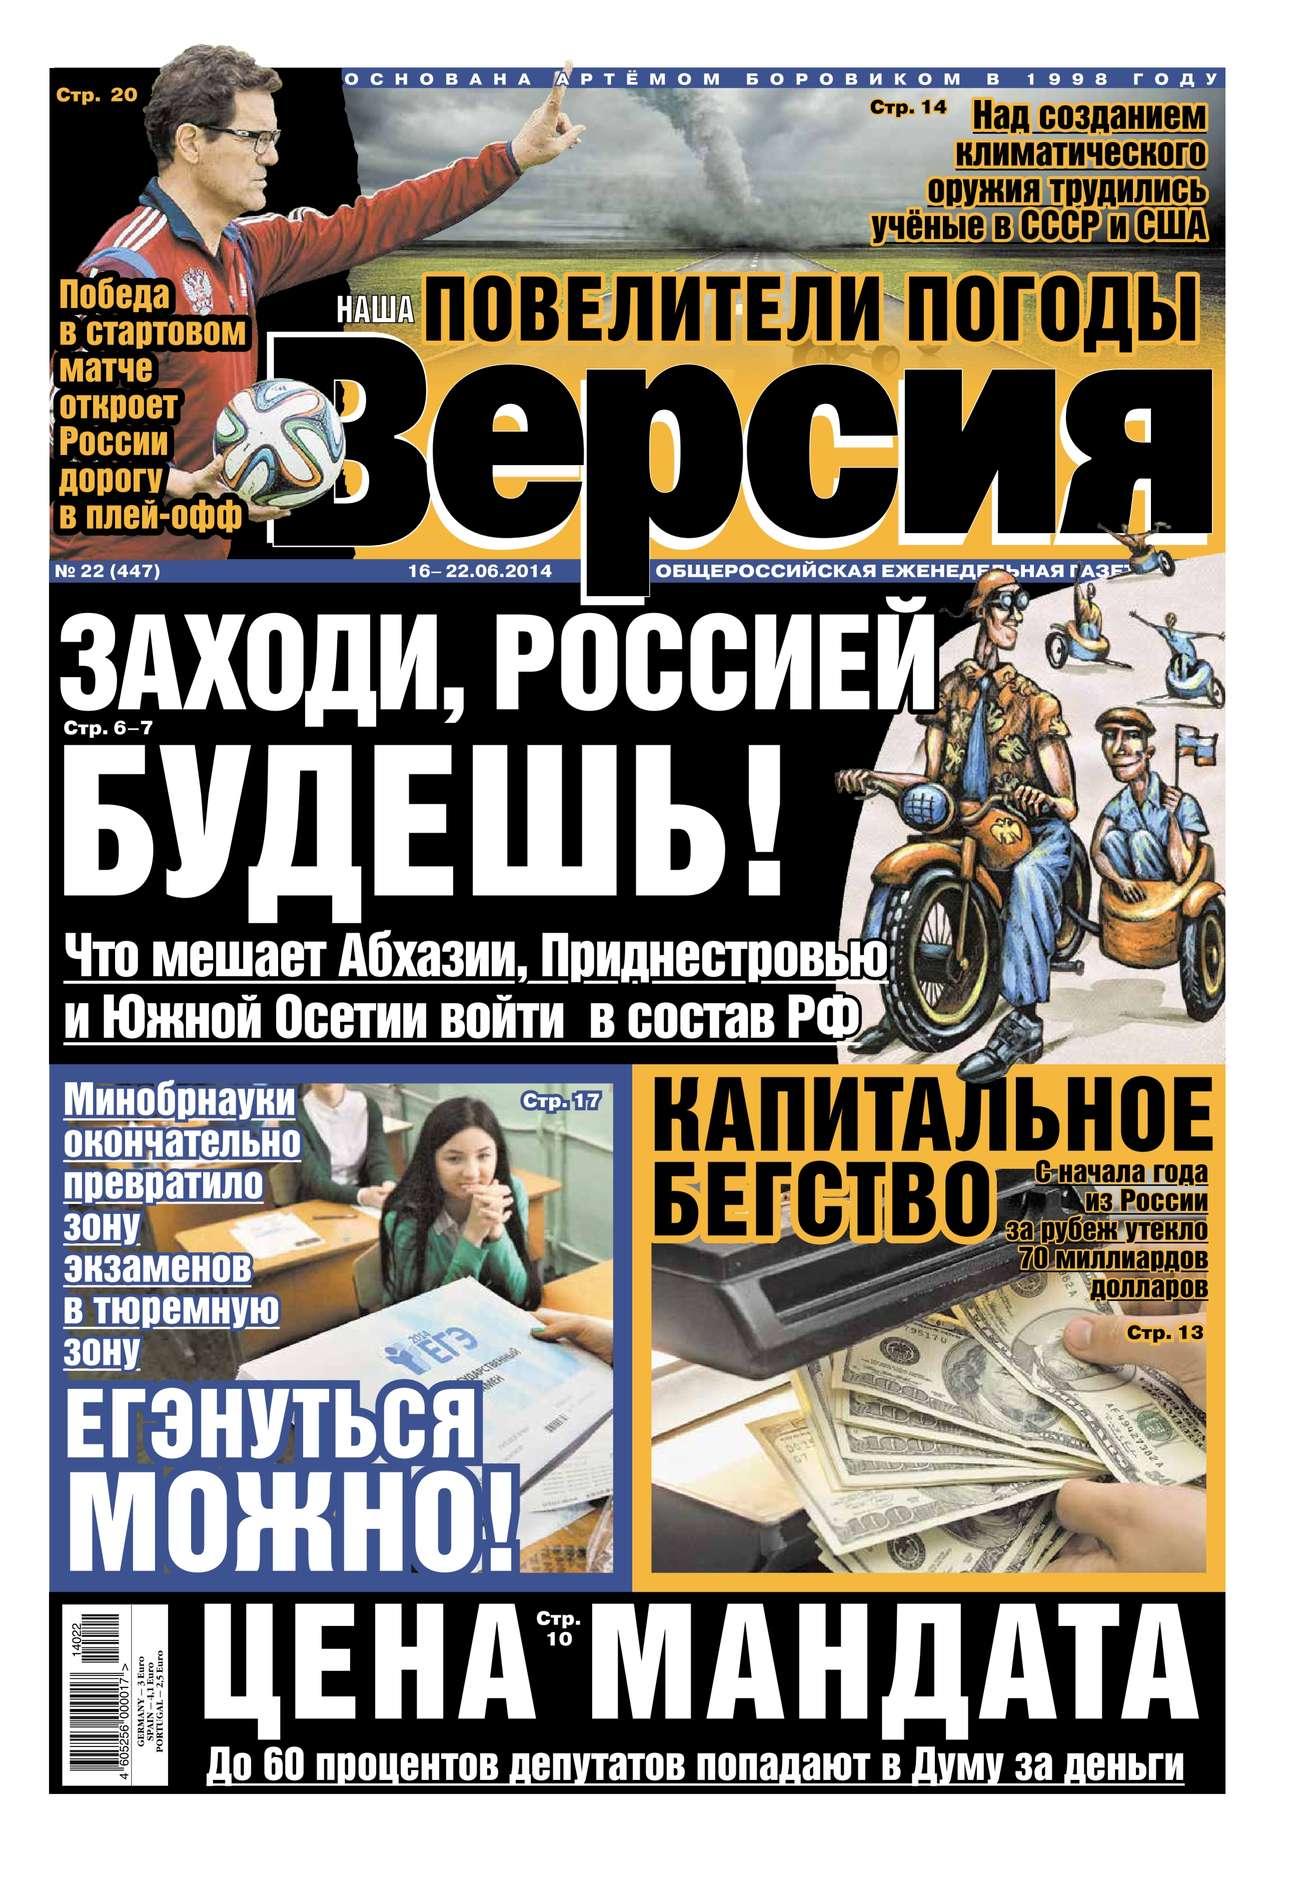 Редакция газеты Наша Версия Наша версия 22-2014 цена и фото